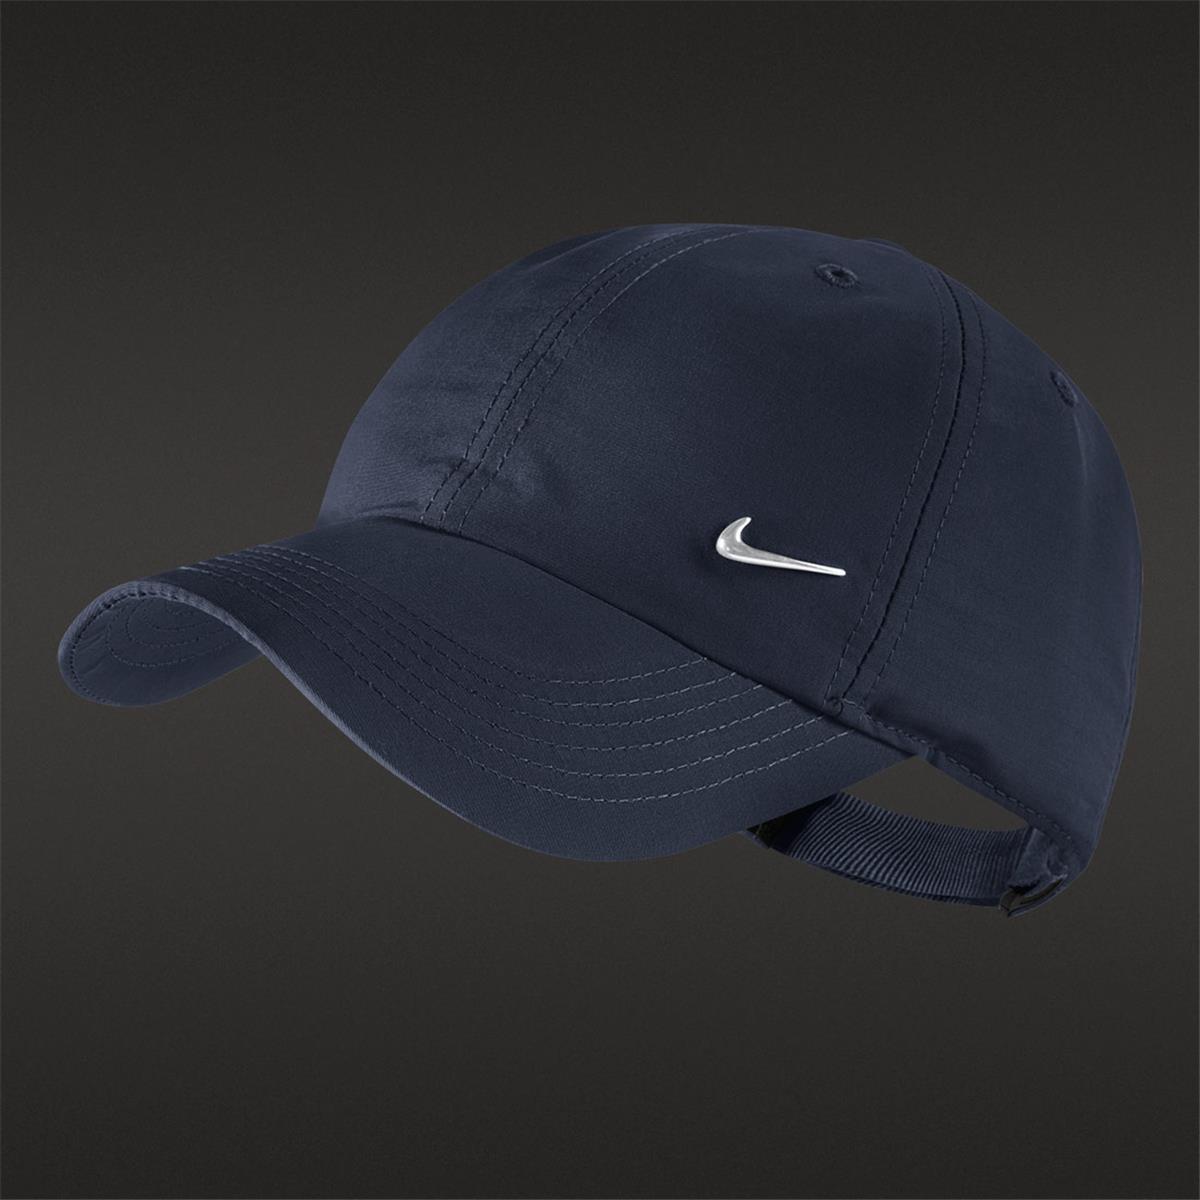 125eb423728 Nike Heritage 86 Junior Cap (Navy)